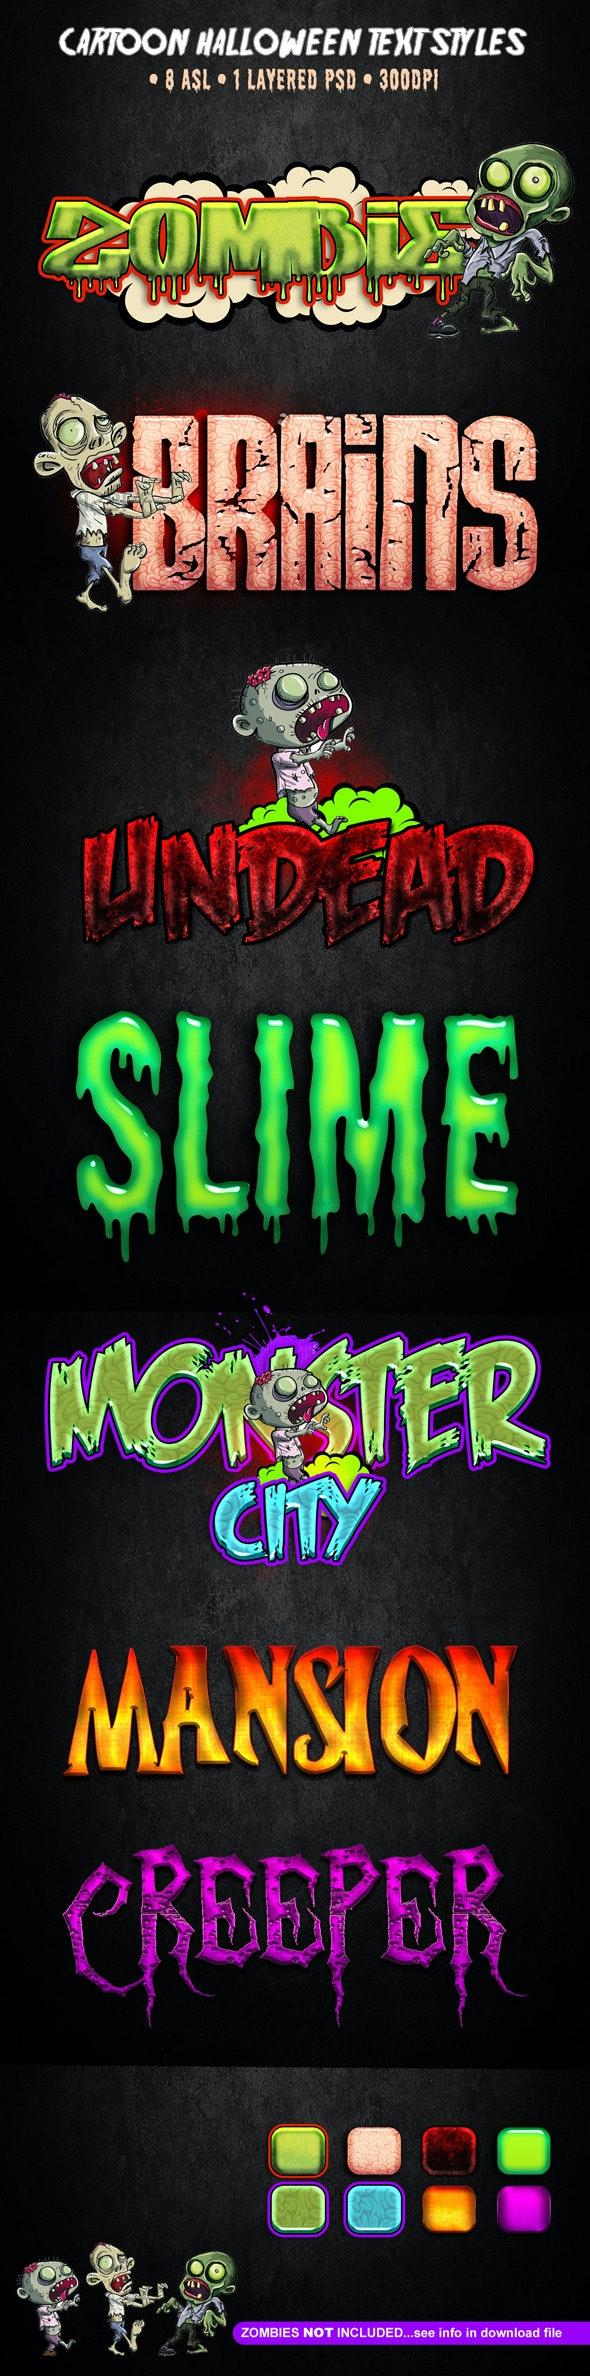 Cartoon Halloween Text Styles - Text Effects Styles